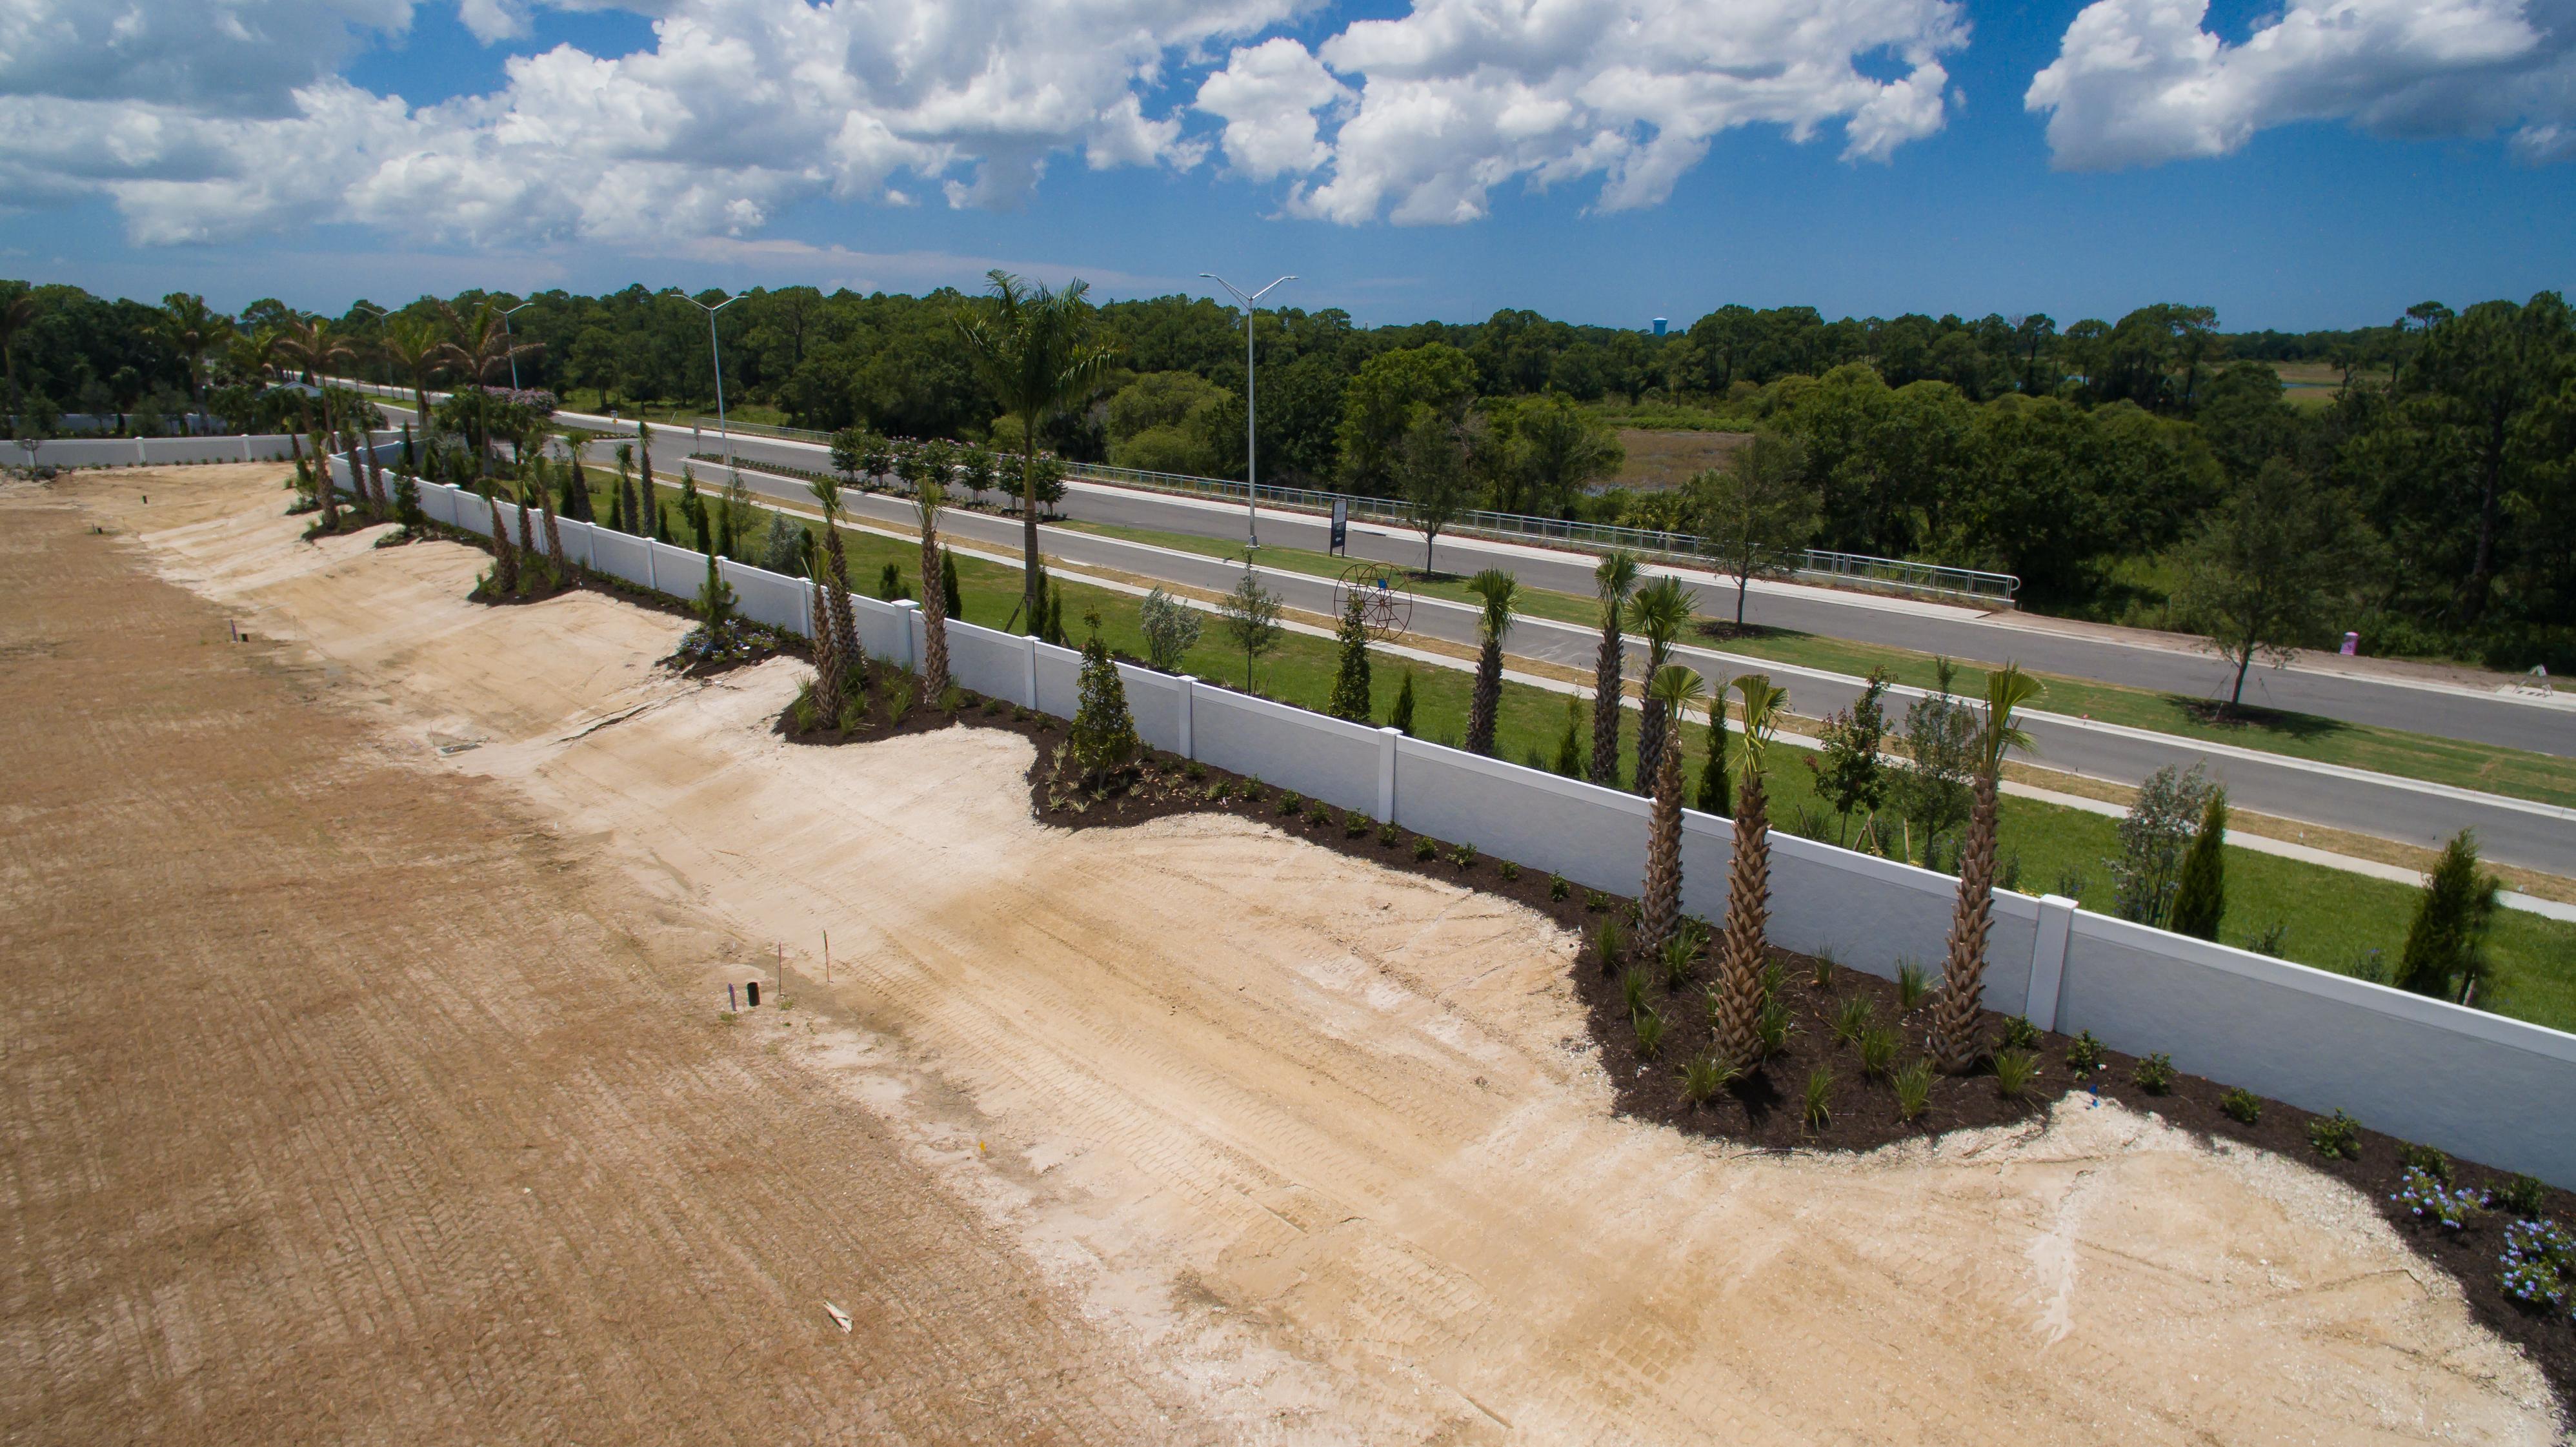 Permacast precast concrete fence in progress